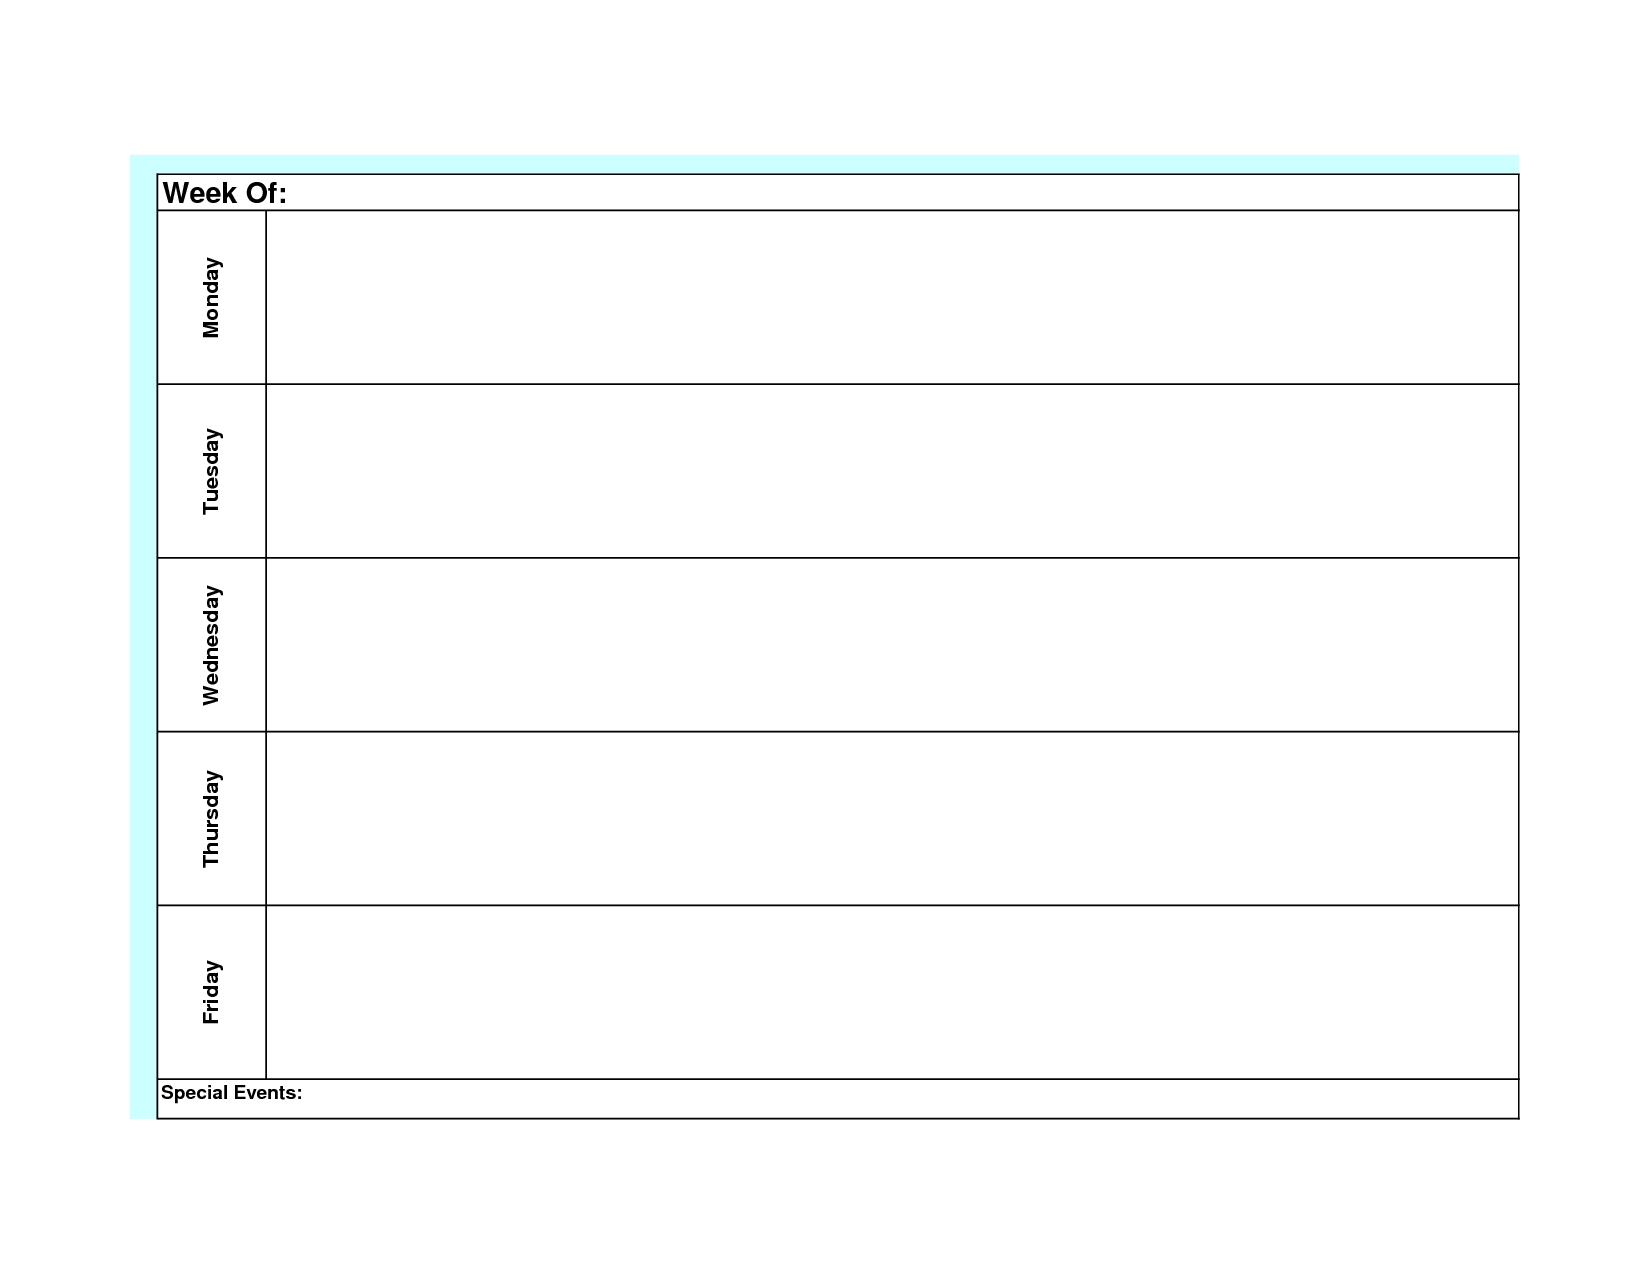 Blank Weekly Calendar Template Monday Friday | Planner-Blank Calendar Page Monday To Friday